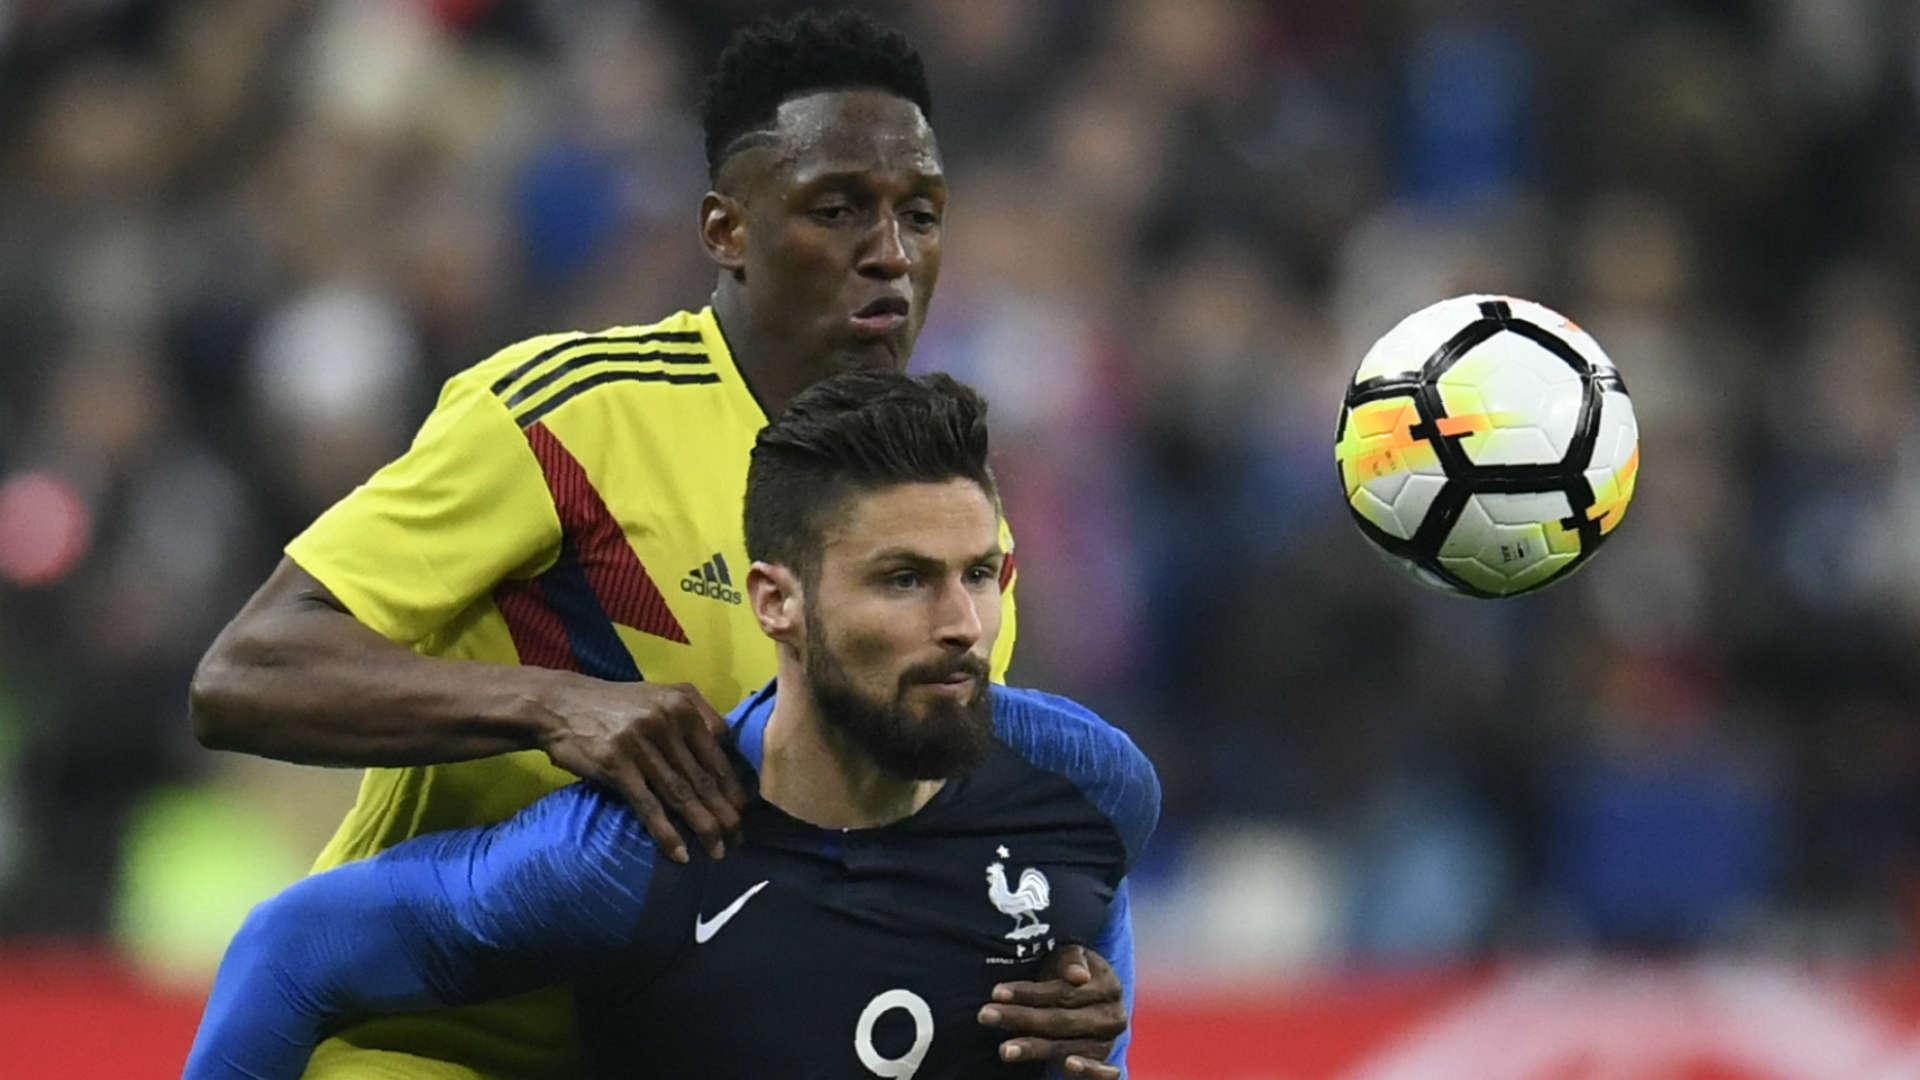 Pháp vừa thua Colombia